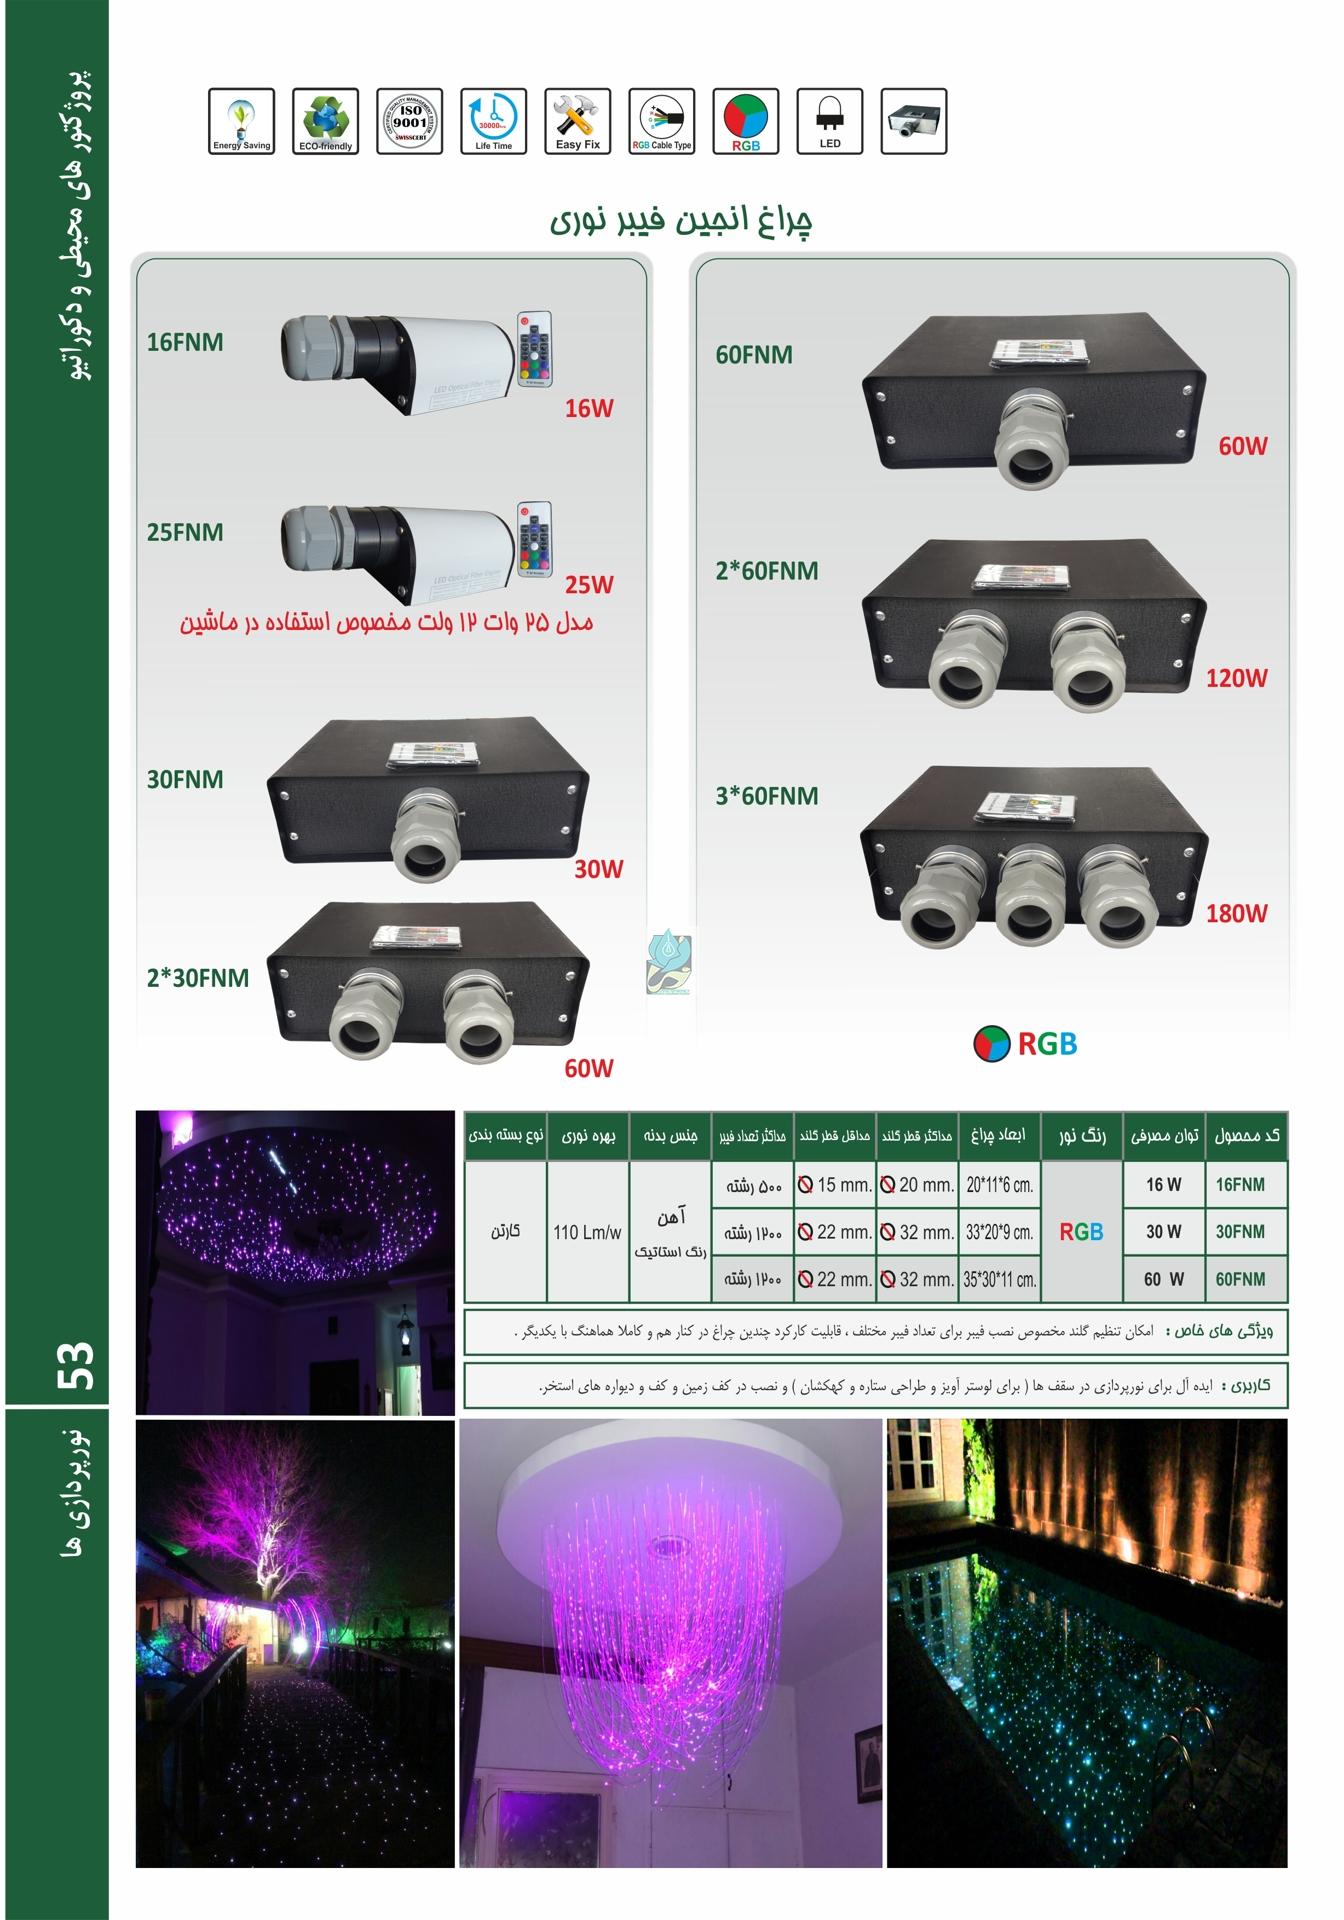 چراغ انجین فیبر نوری فول کالر 2 گلند 60 وات - قیمت چراغ انجین فول کالر 2 گلند - قیمت چراغ انجین فول کالر فیبر نوری - قیمت چراغ انجین فیبر نوری 2 گلند فول کالر